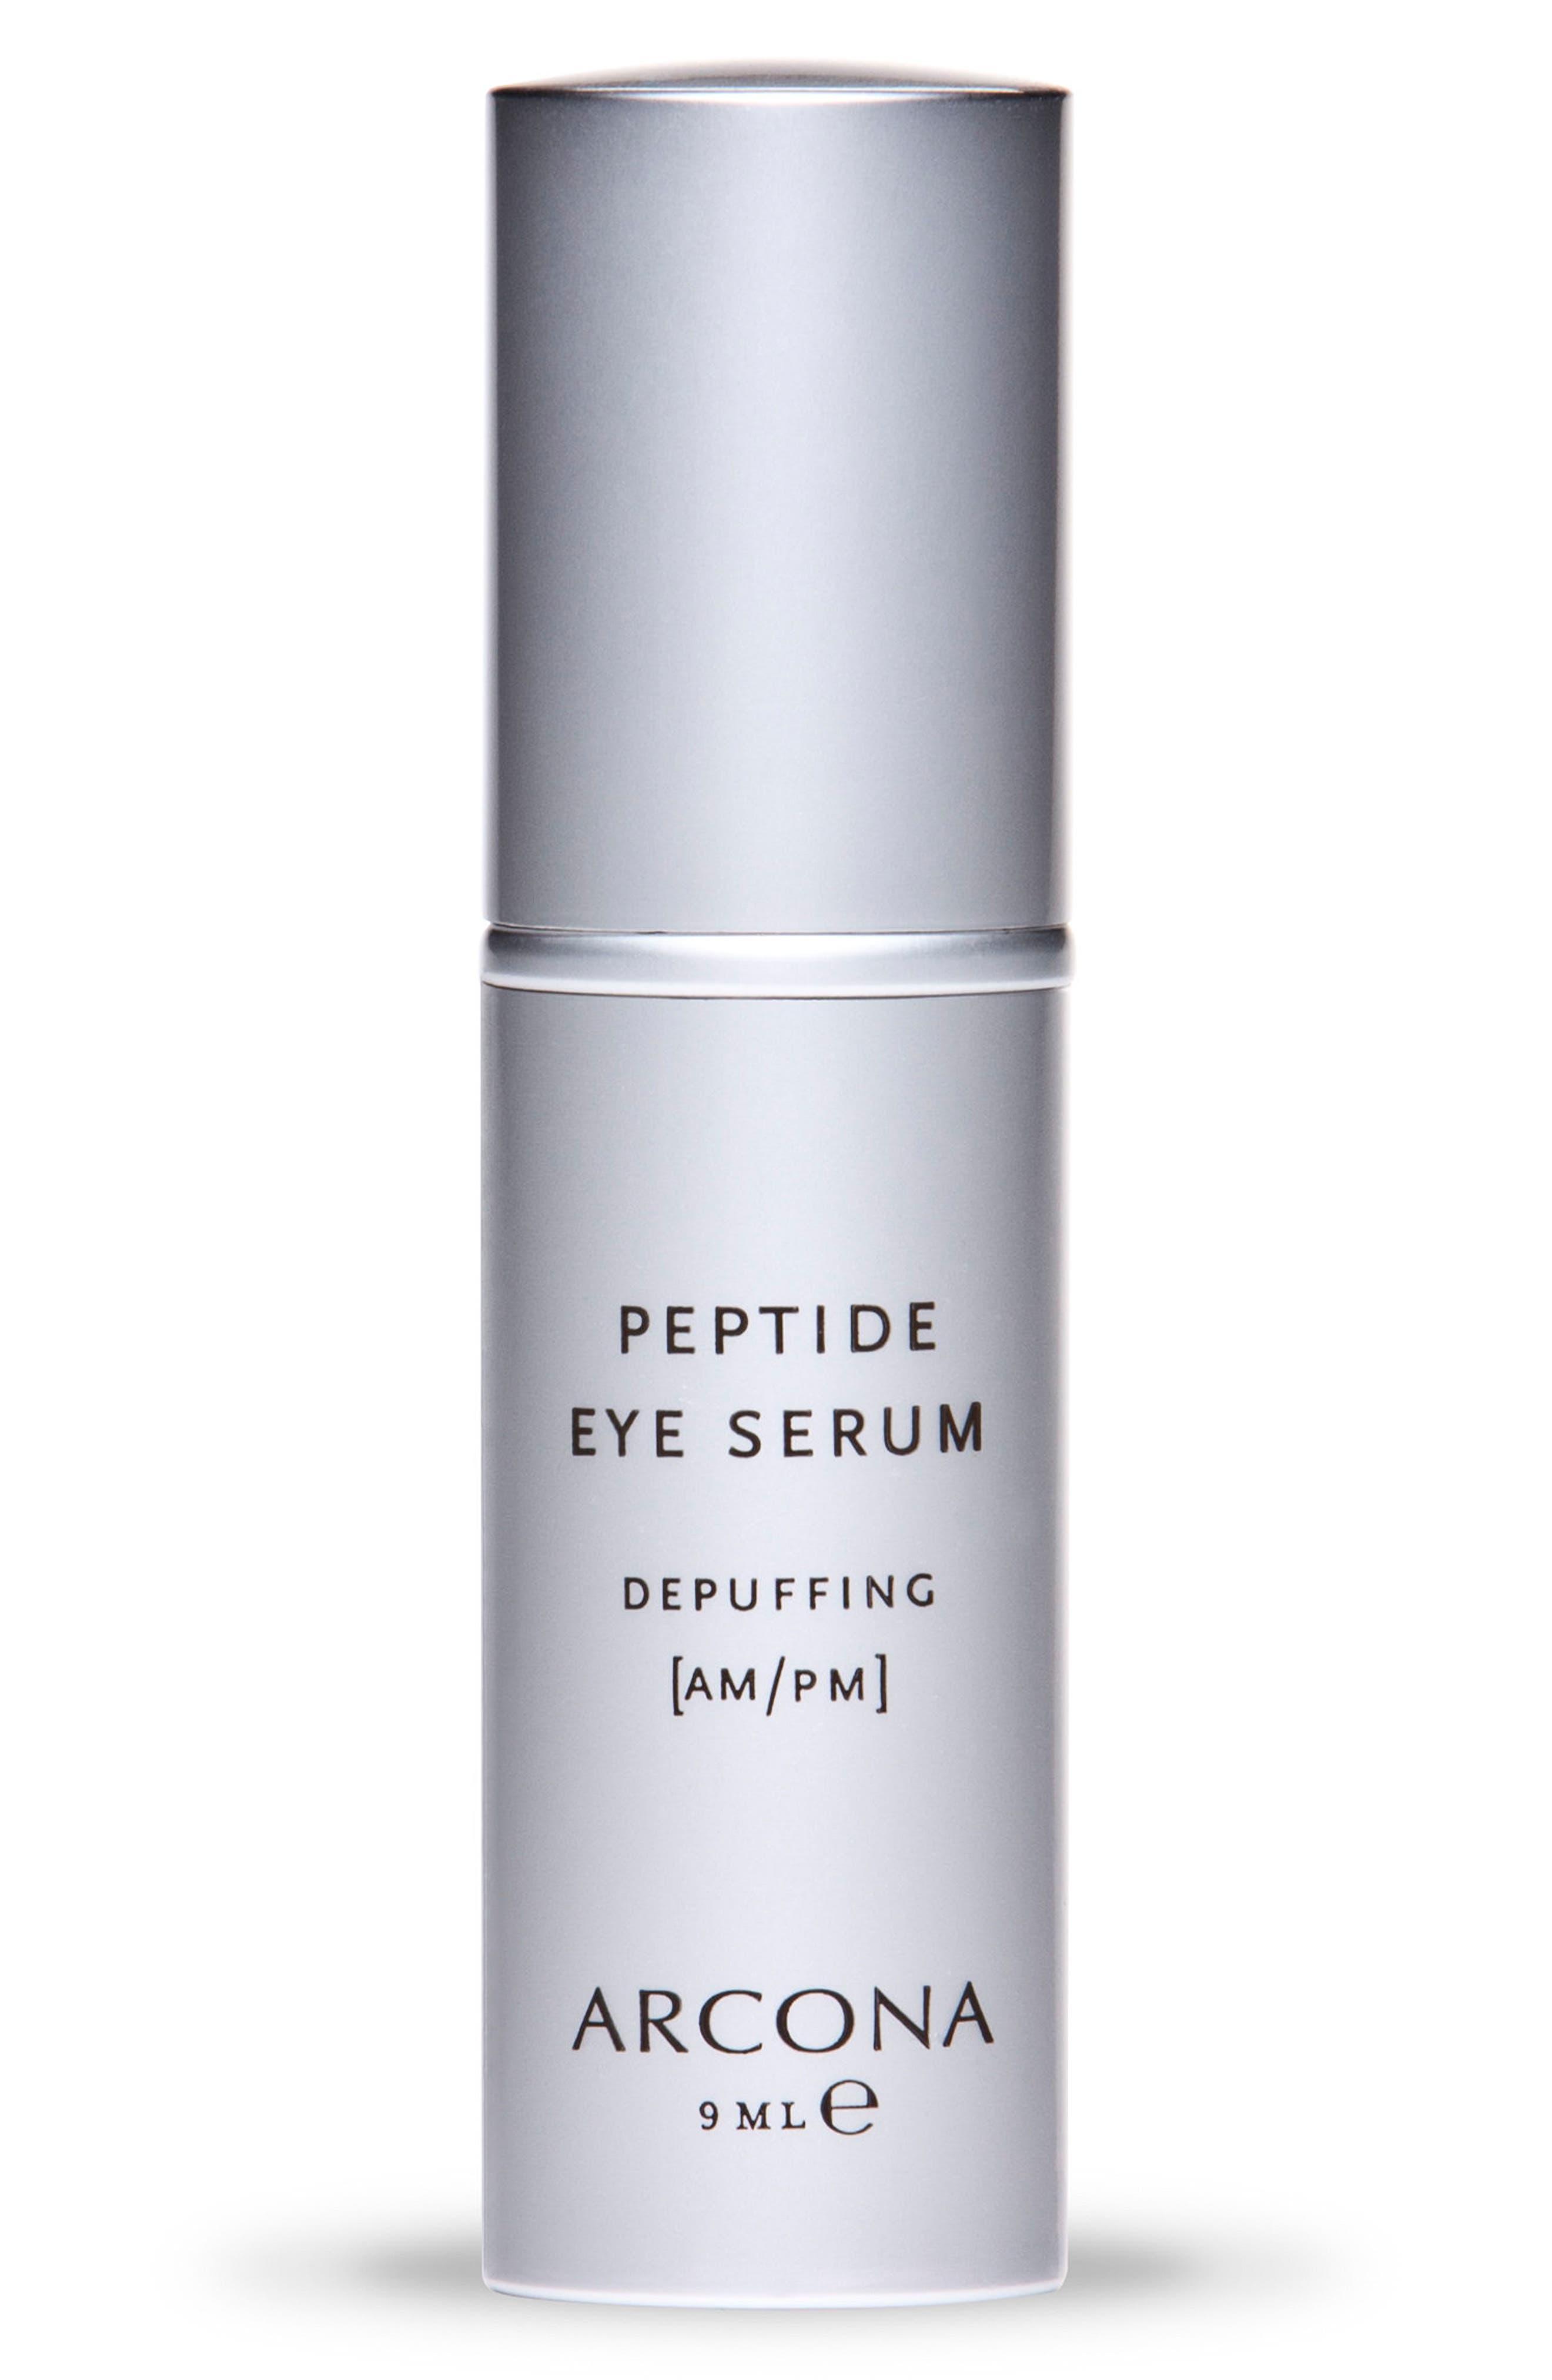 Alternate Image 1 Selected - ARCONA Peptide Eye Serum